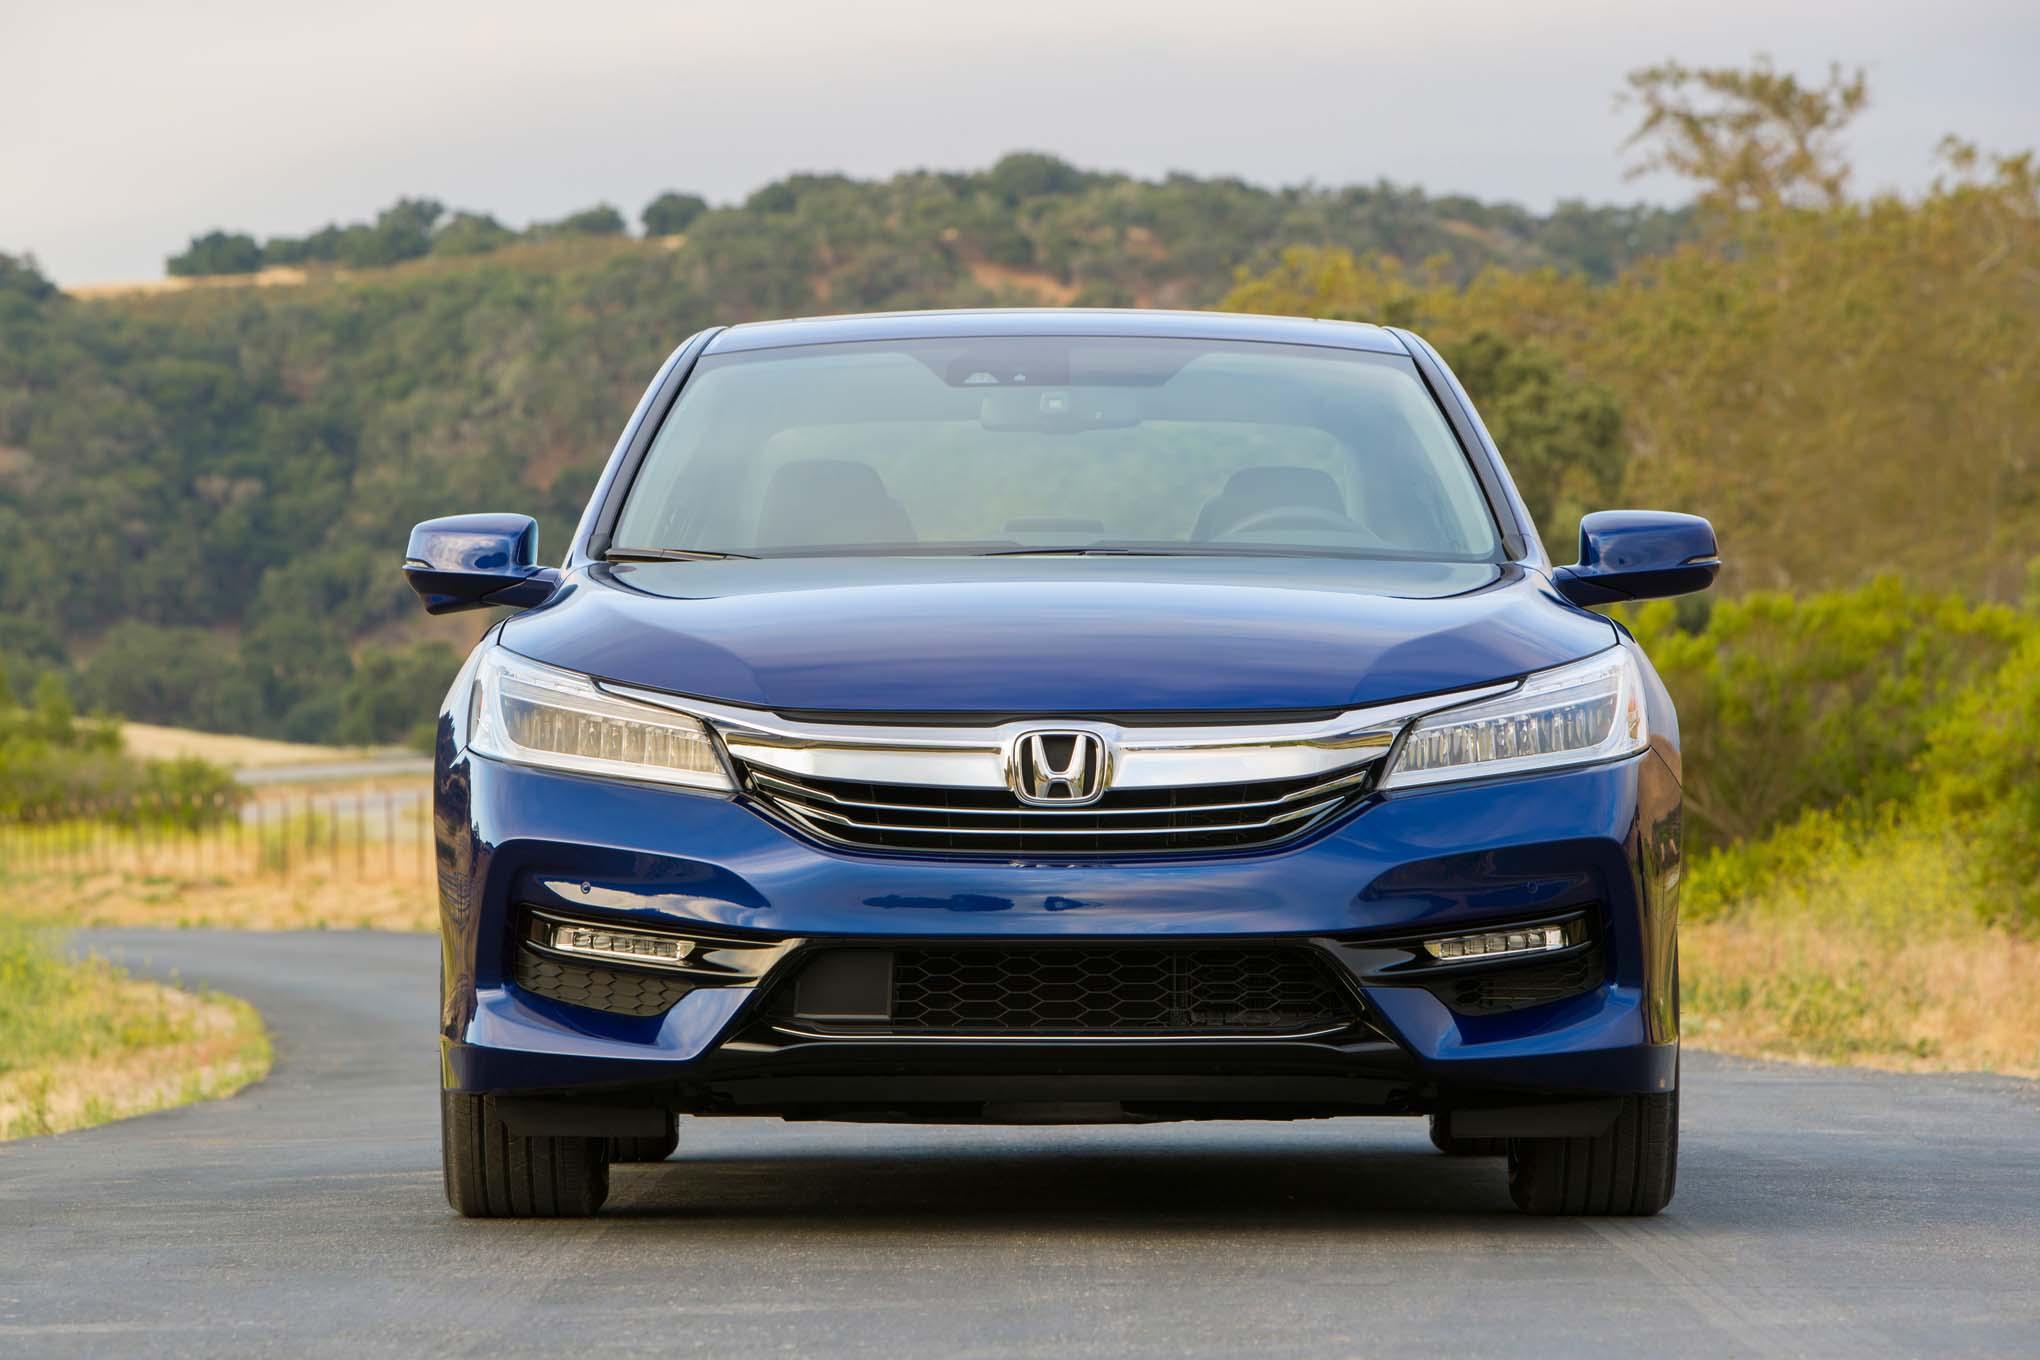 2017 Honda Accord Hybrid Front End